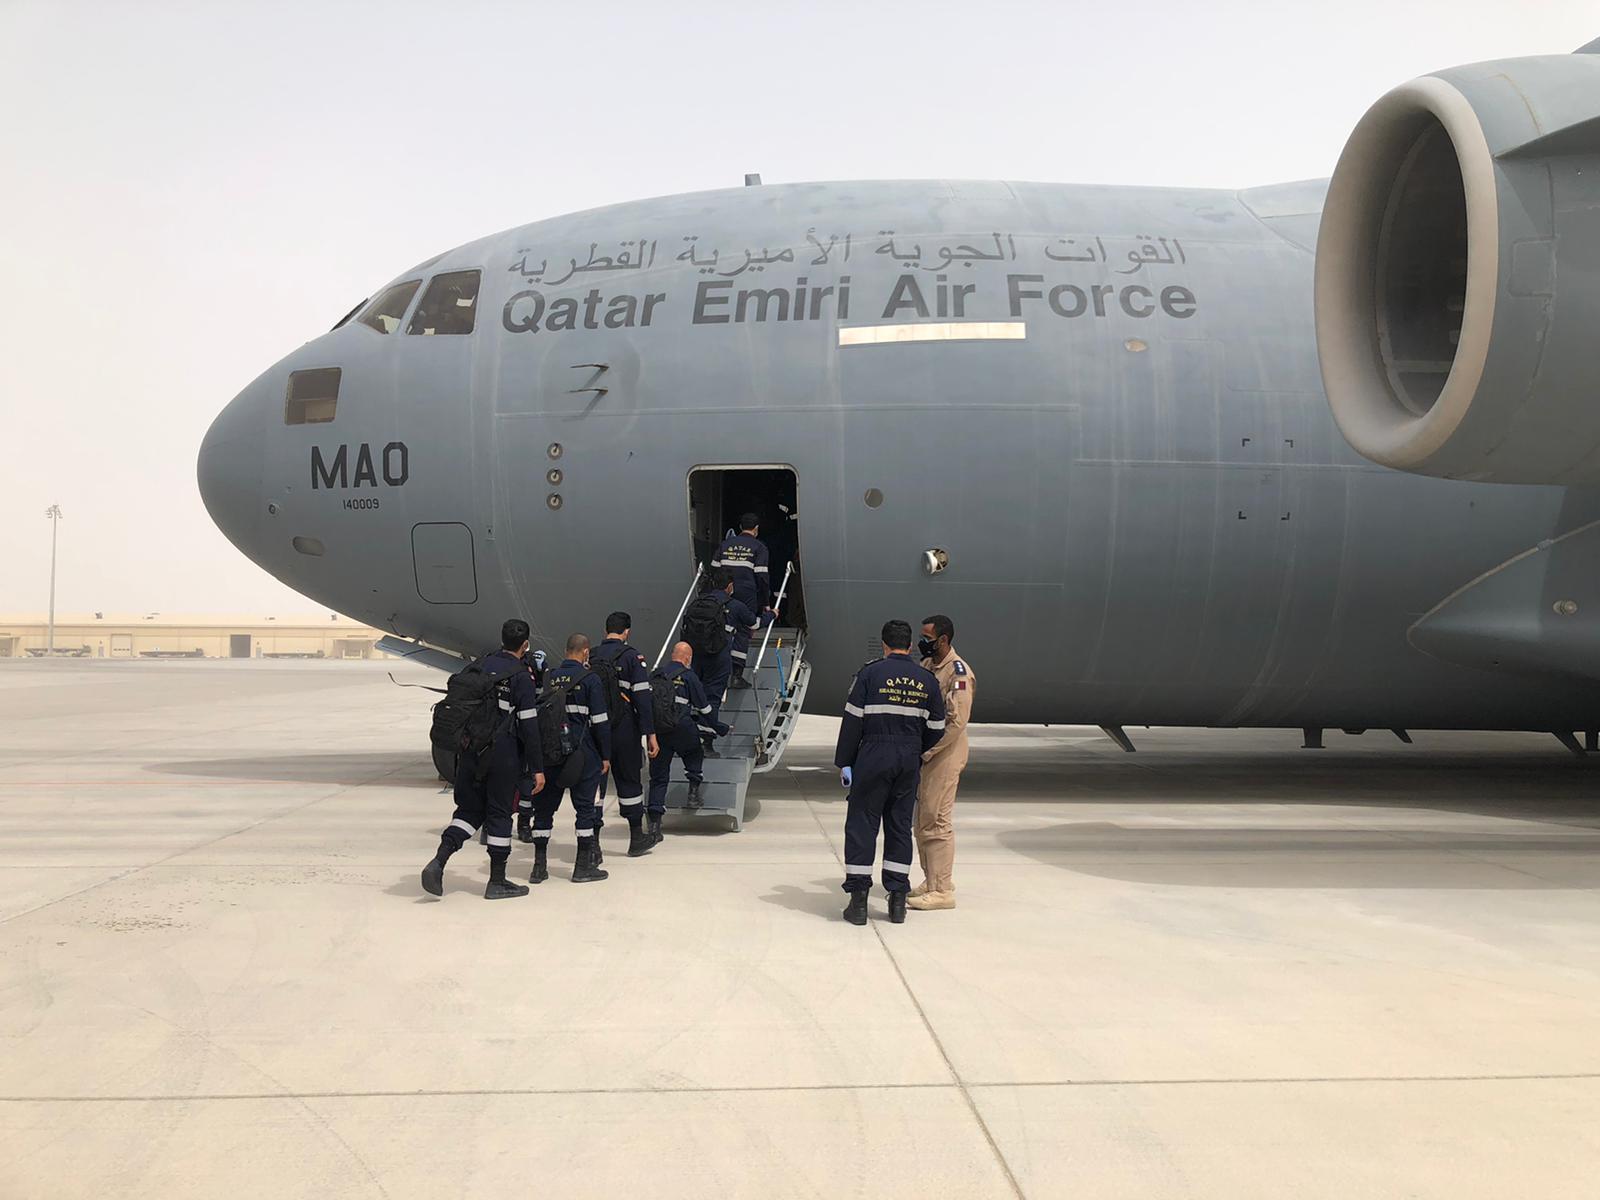 Qatar's medical aid aircraft arrives in Equatorial Guinea